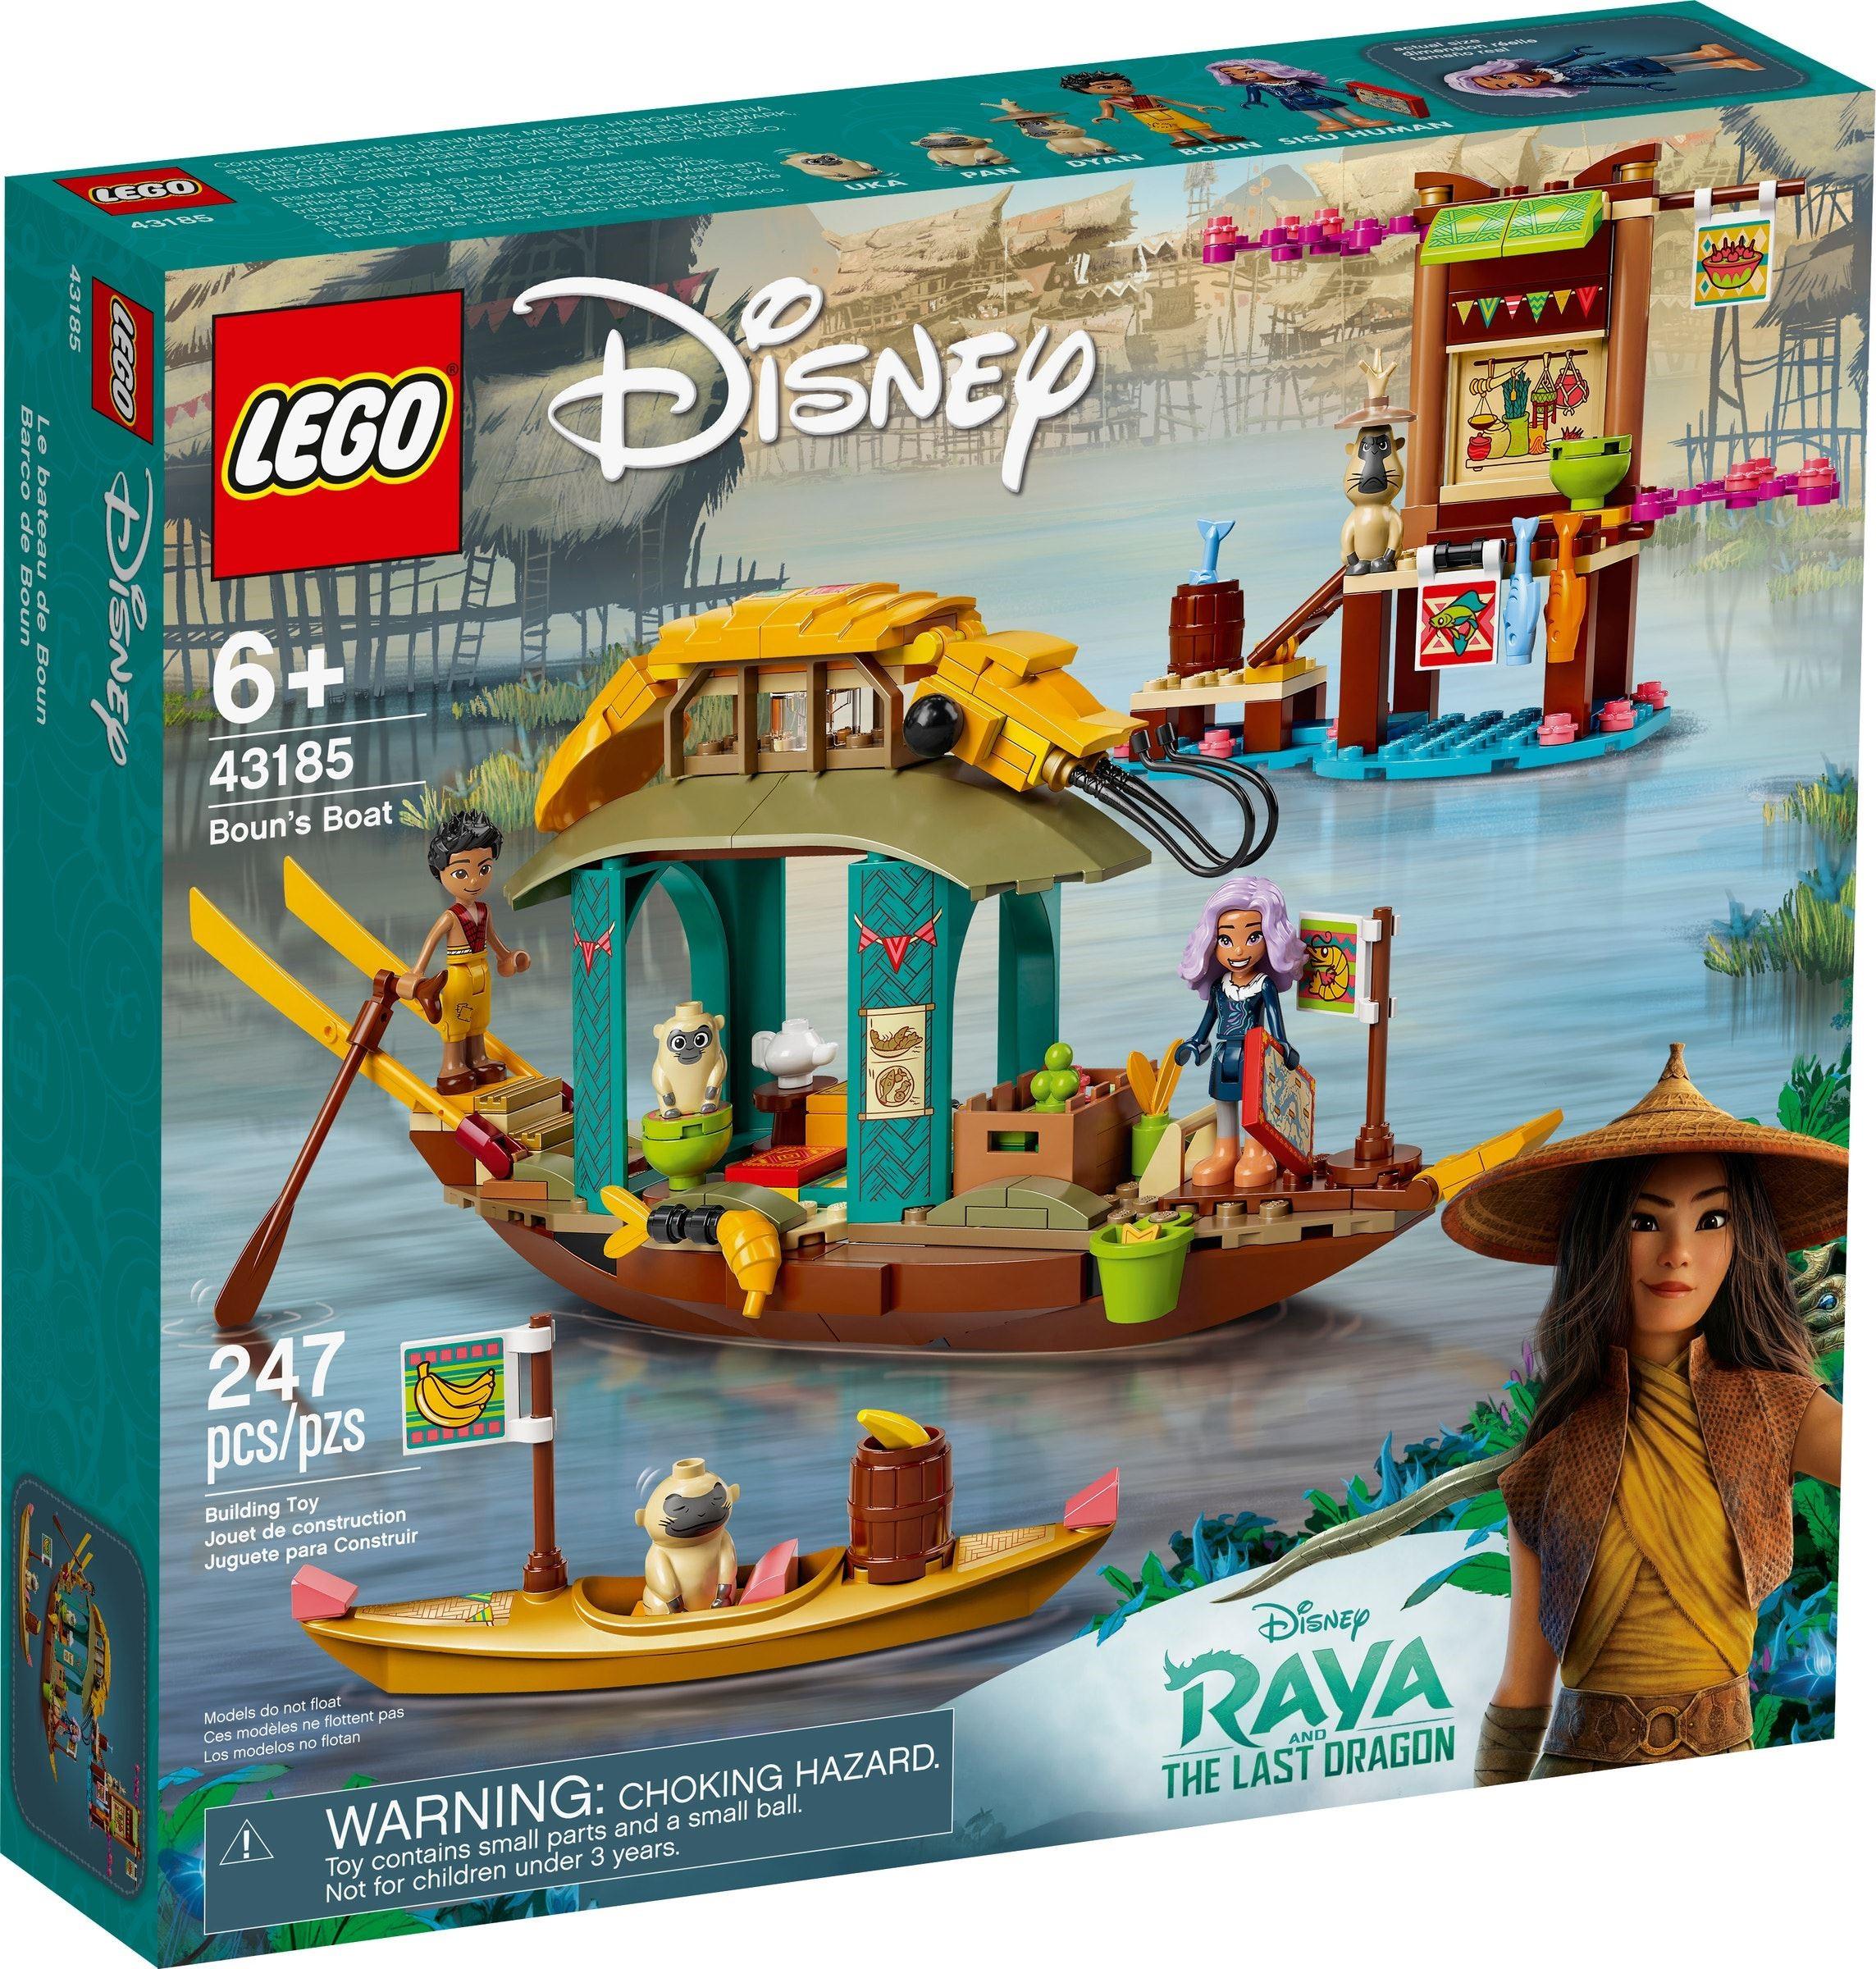 LEGO Disney Princess - Boun's Boat (43185)